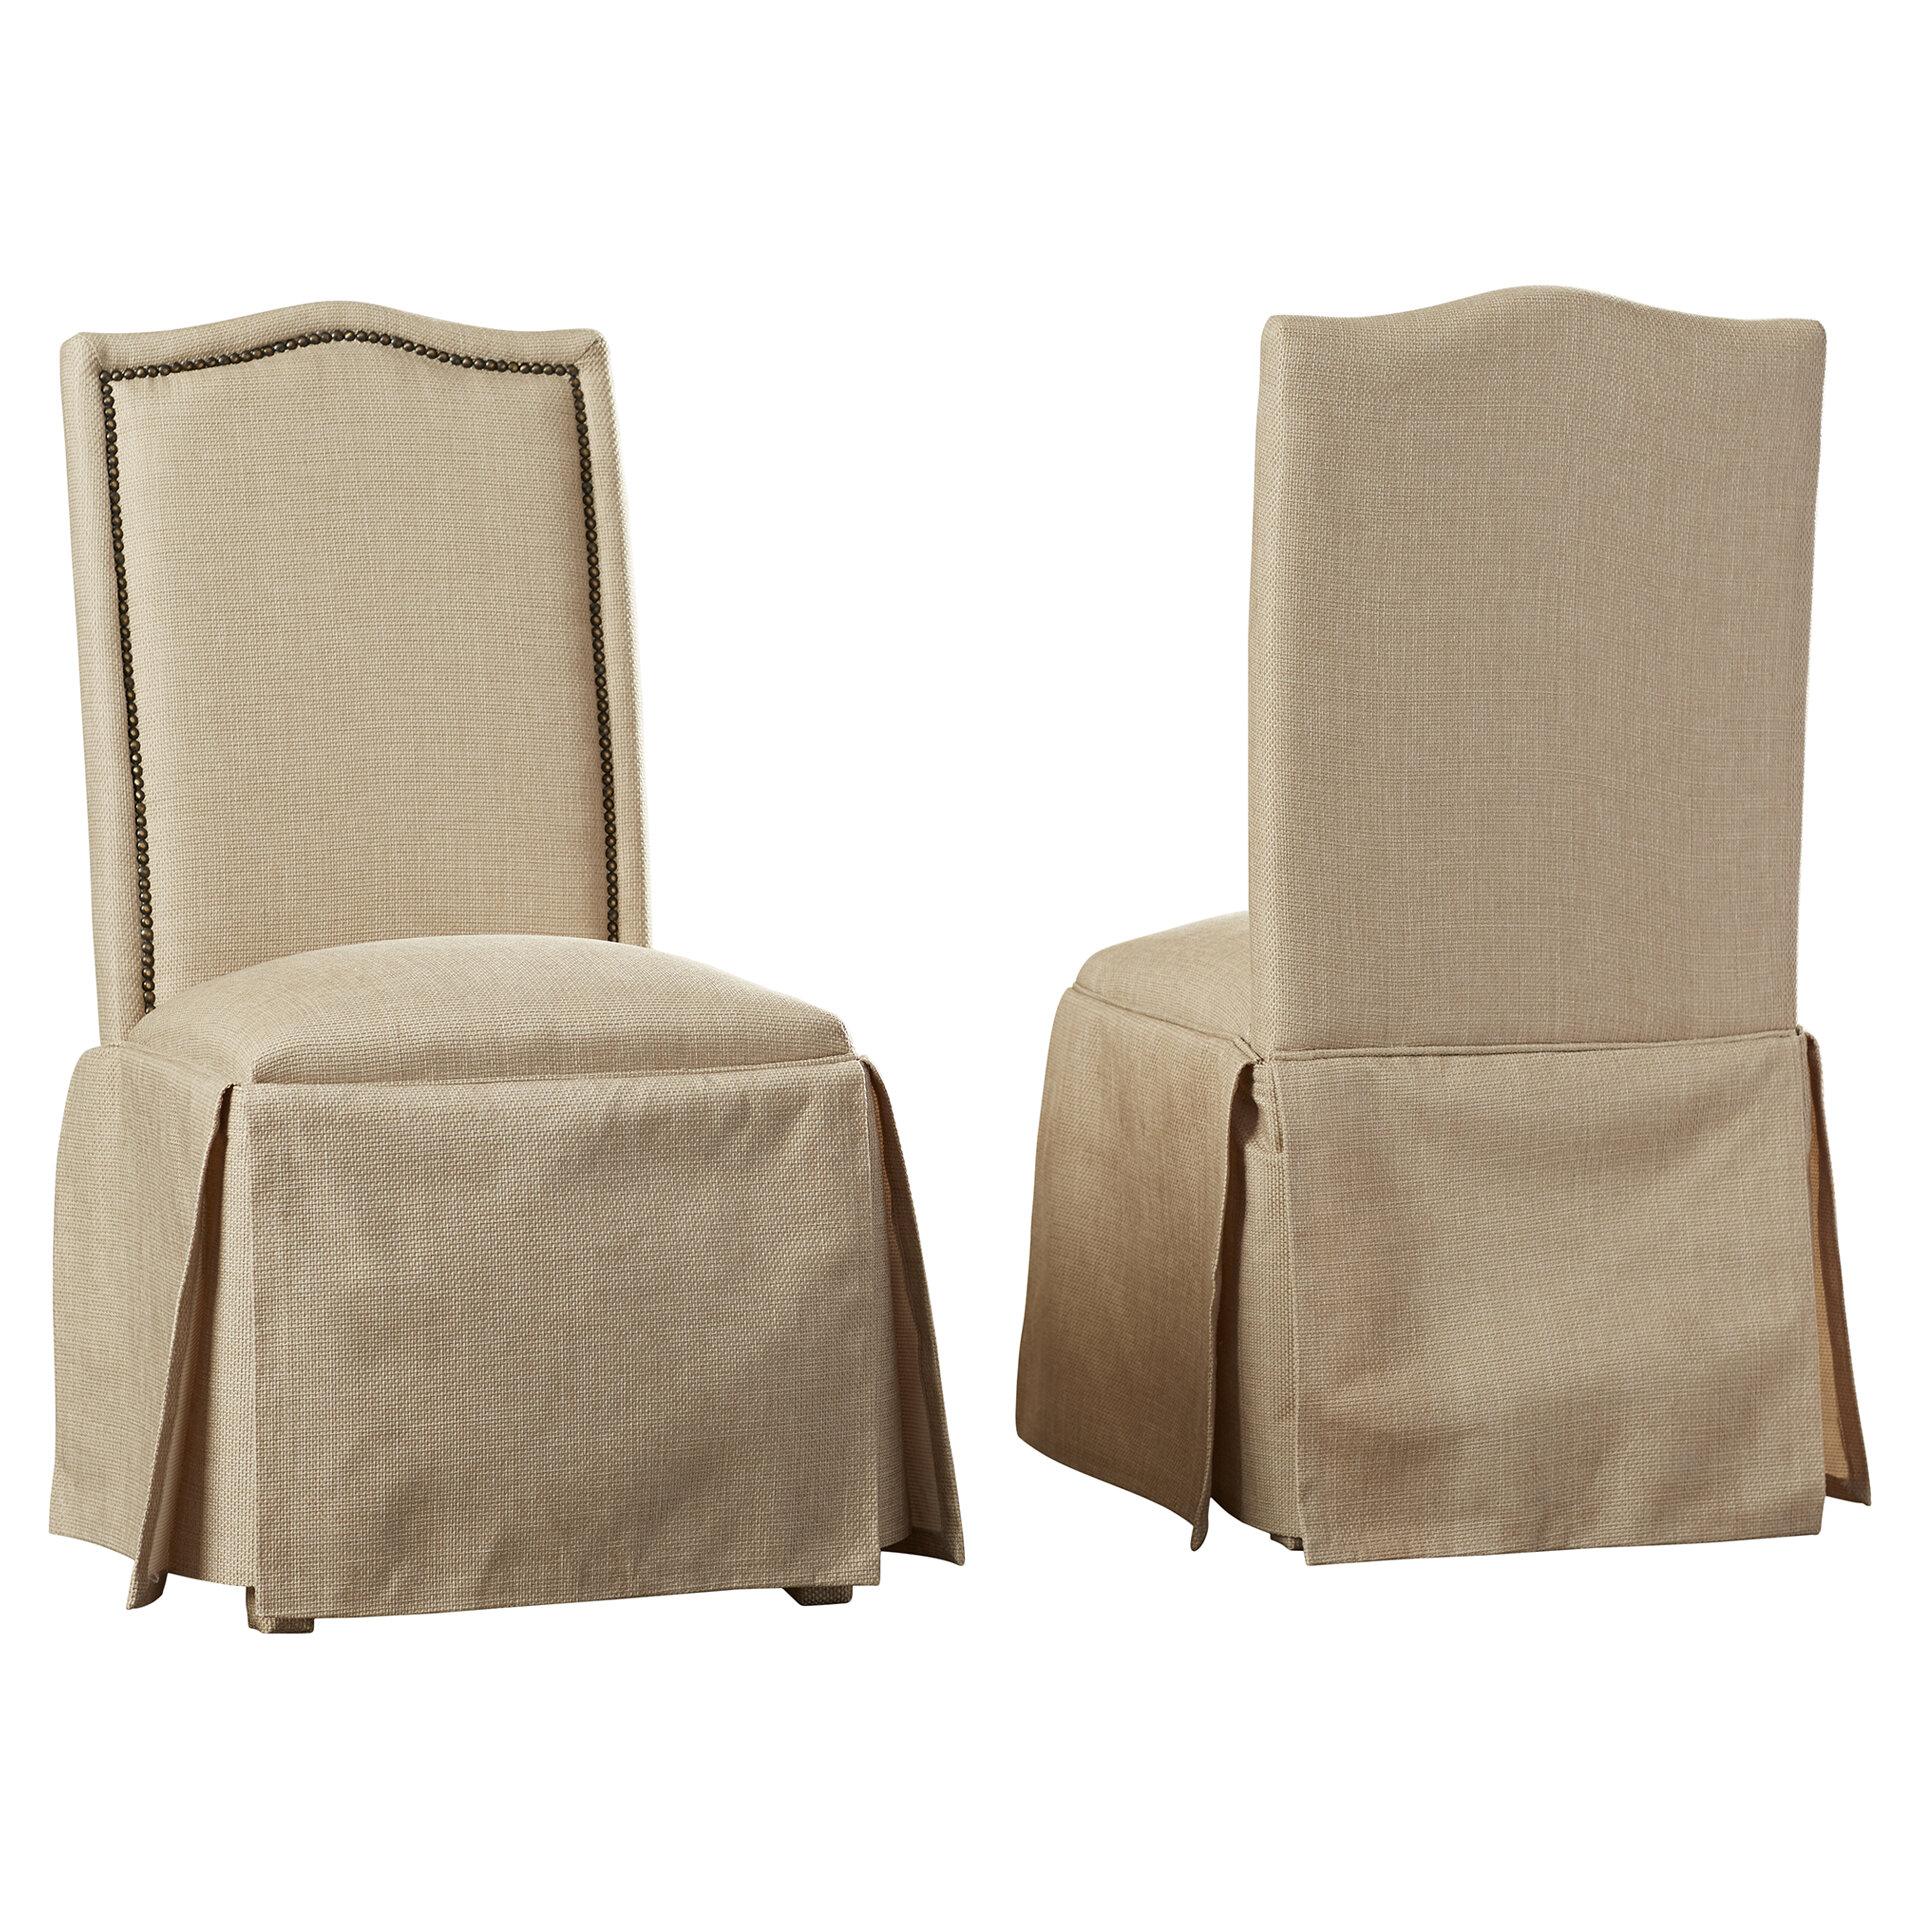 Alison Skirted Upholstered Parson Chair